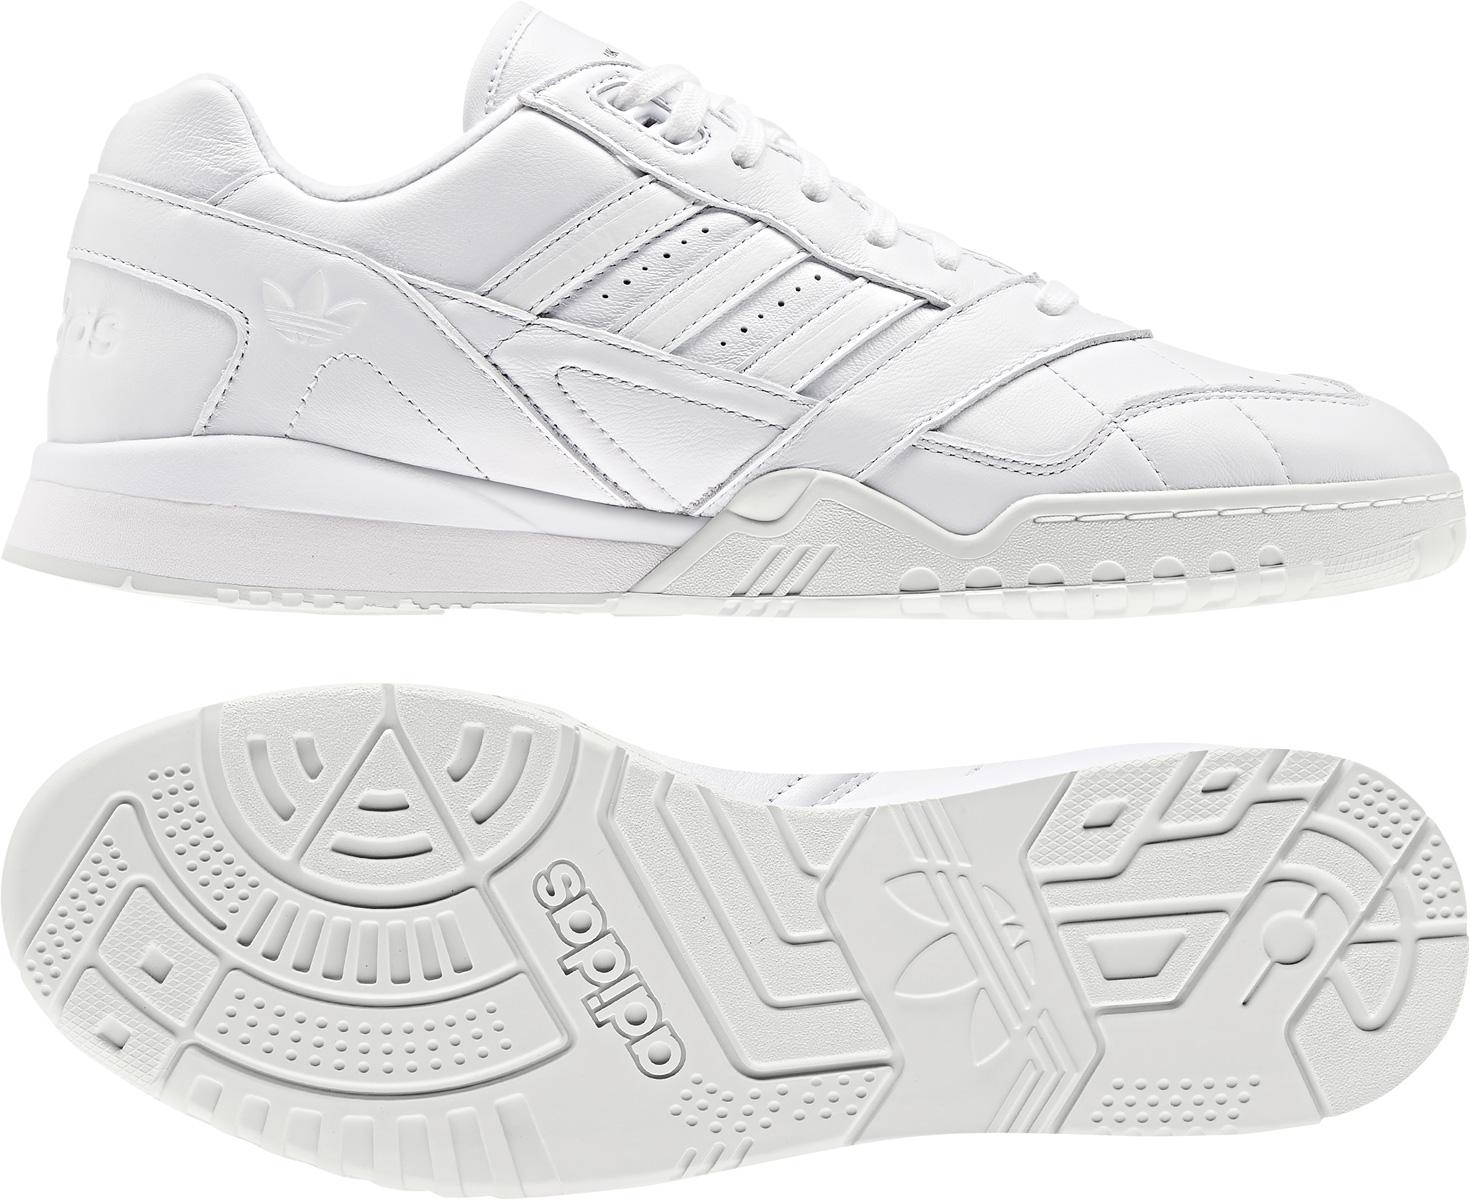 Adidas A.R. Trainer PVP 99,95€